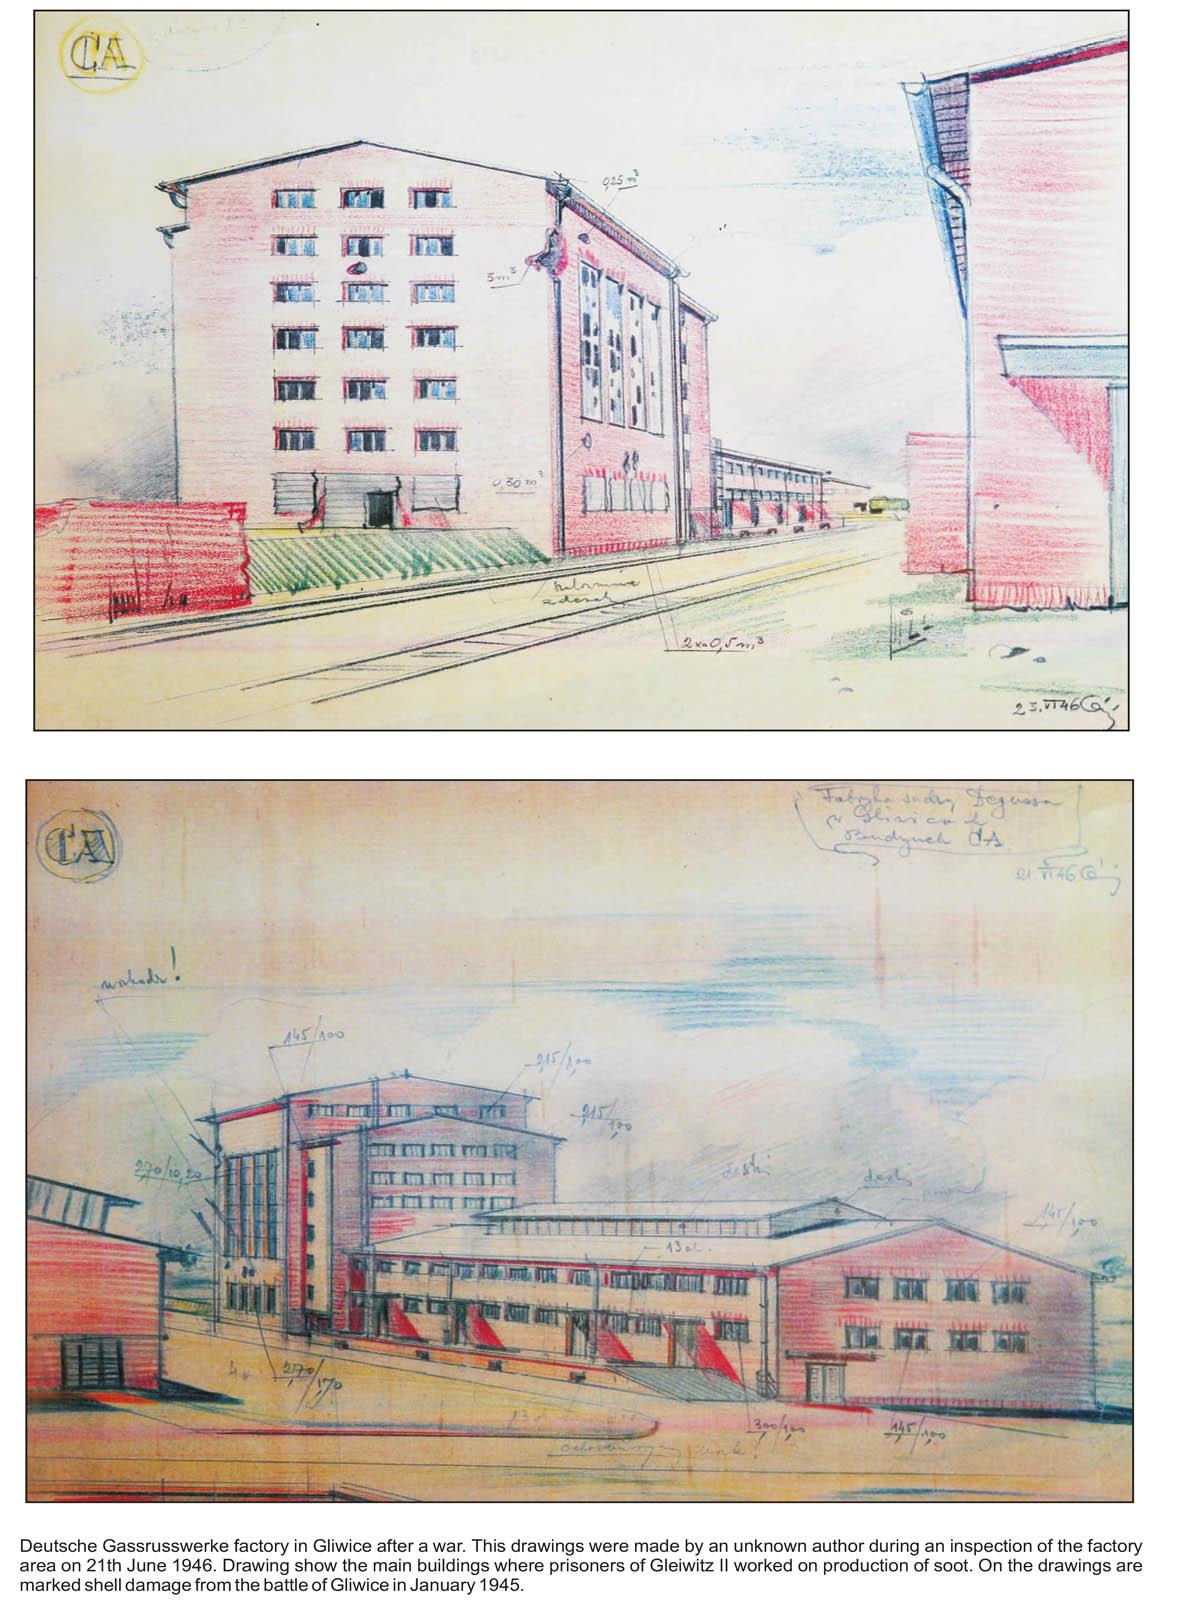 Drawings of Deutsche Garusswerke